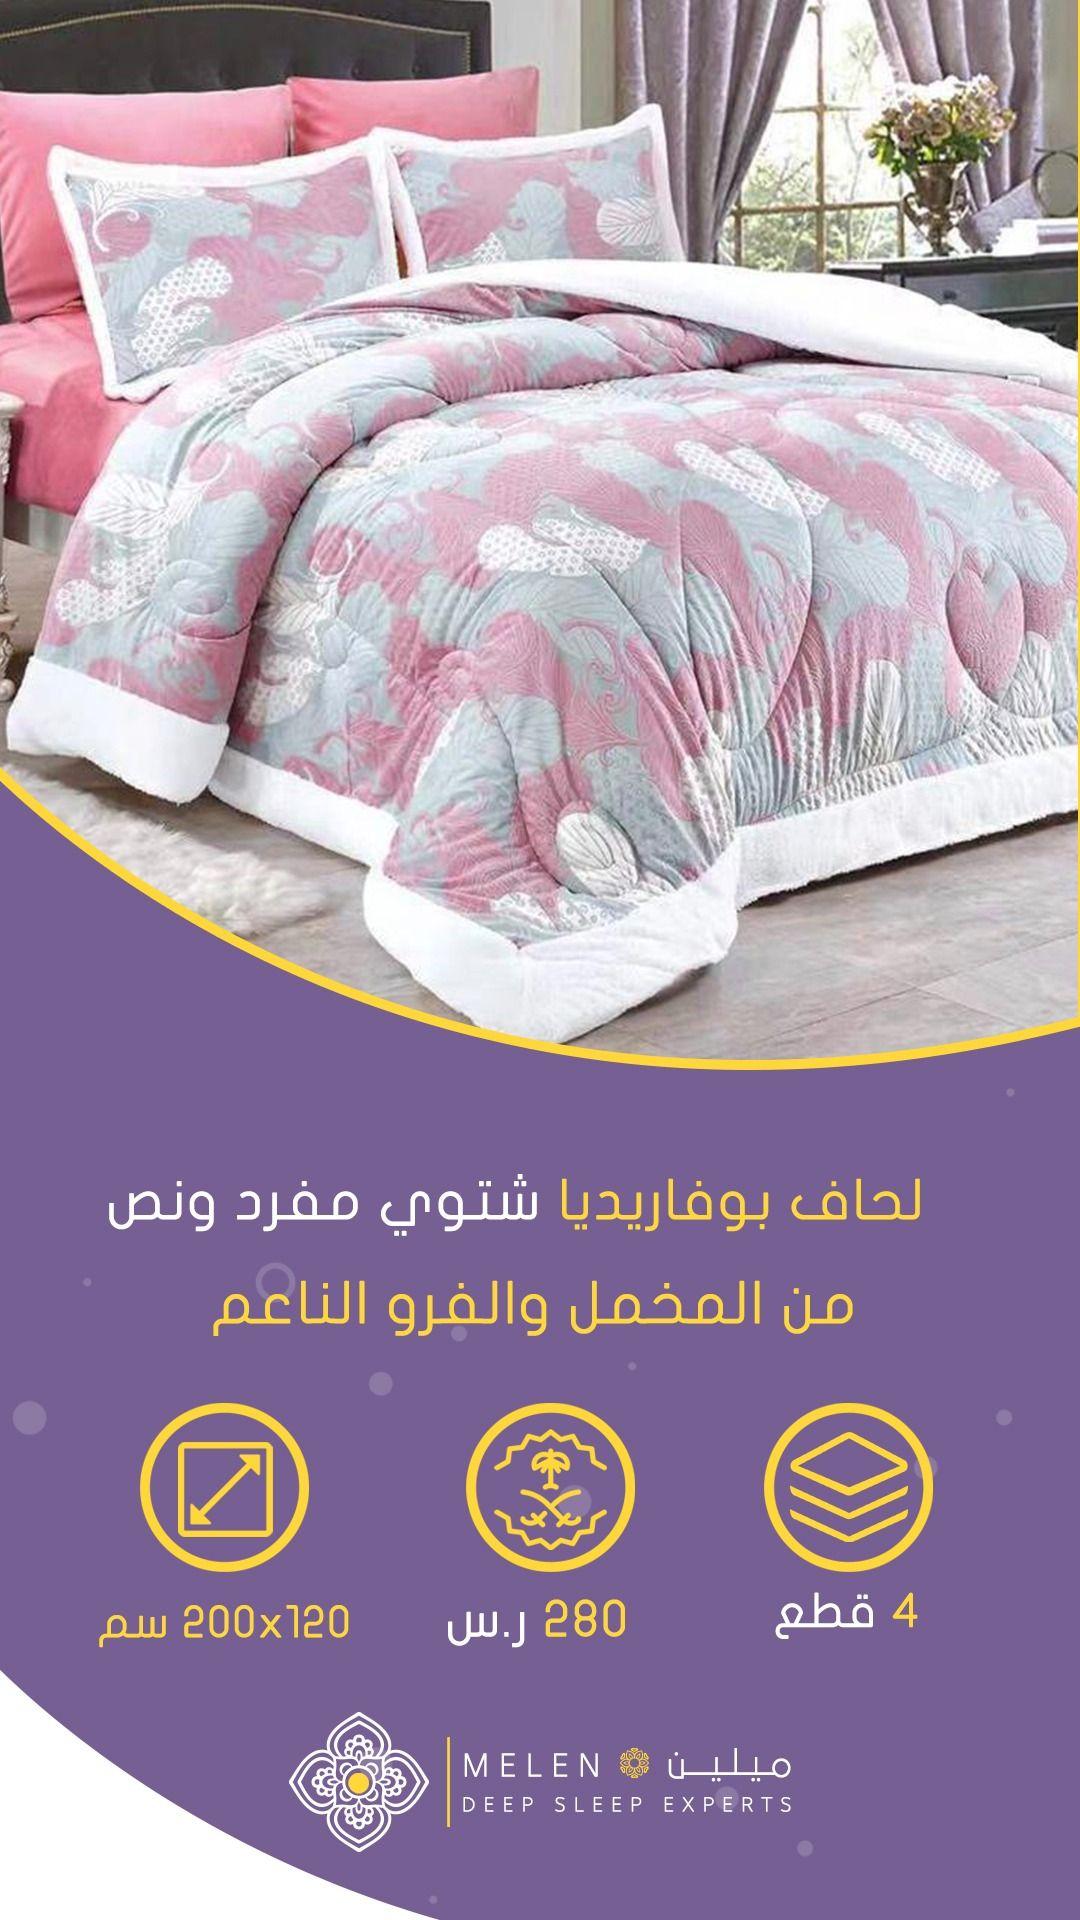 مفارش شتوية مفرد ونص مفارش ميلين Bed Blanket Home